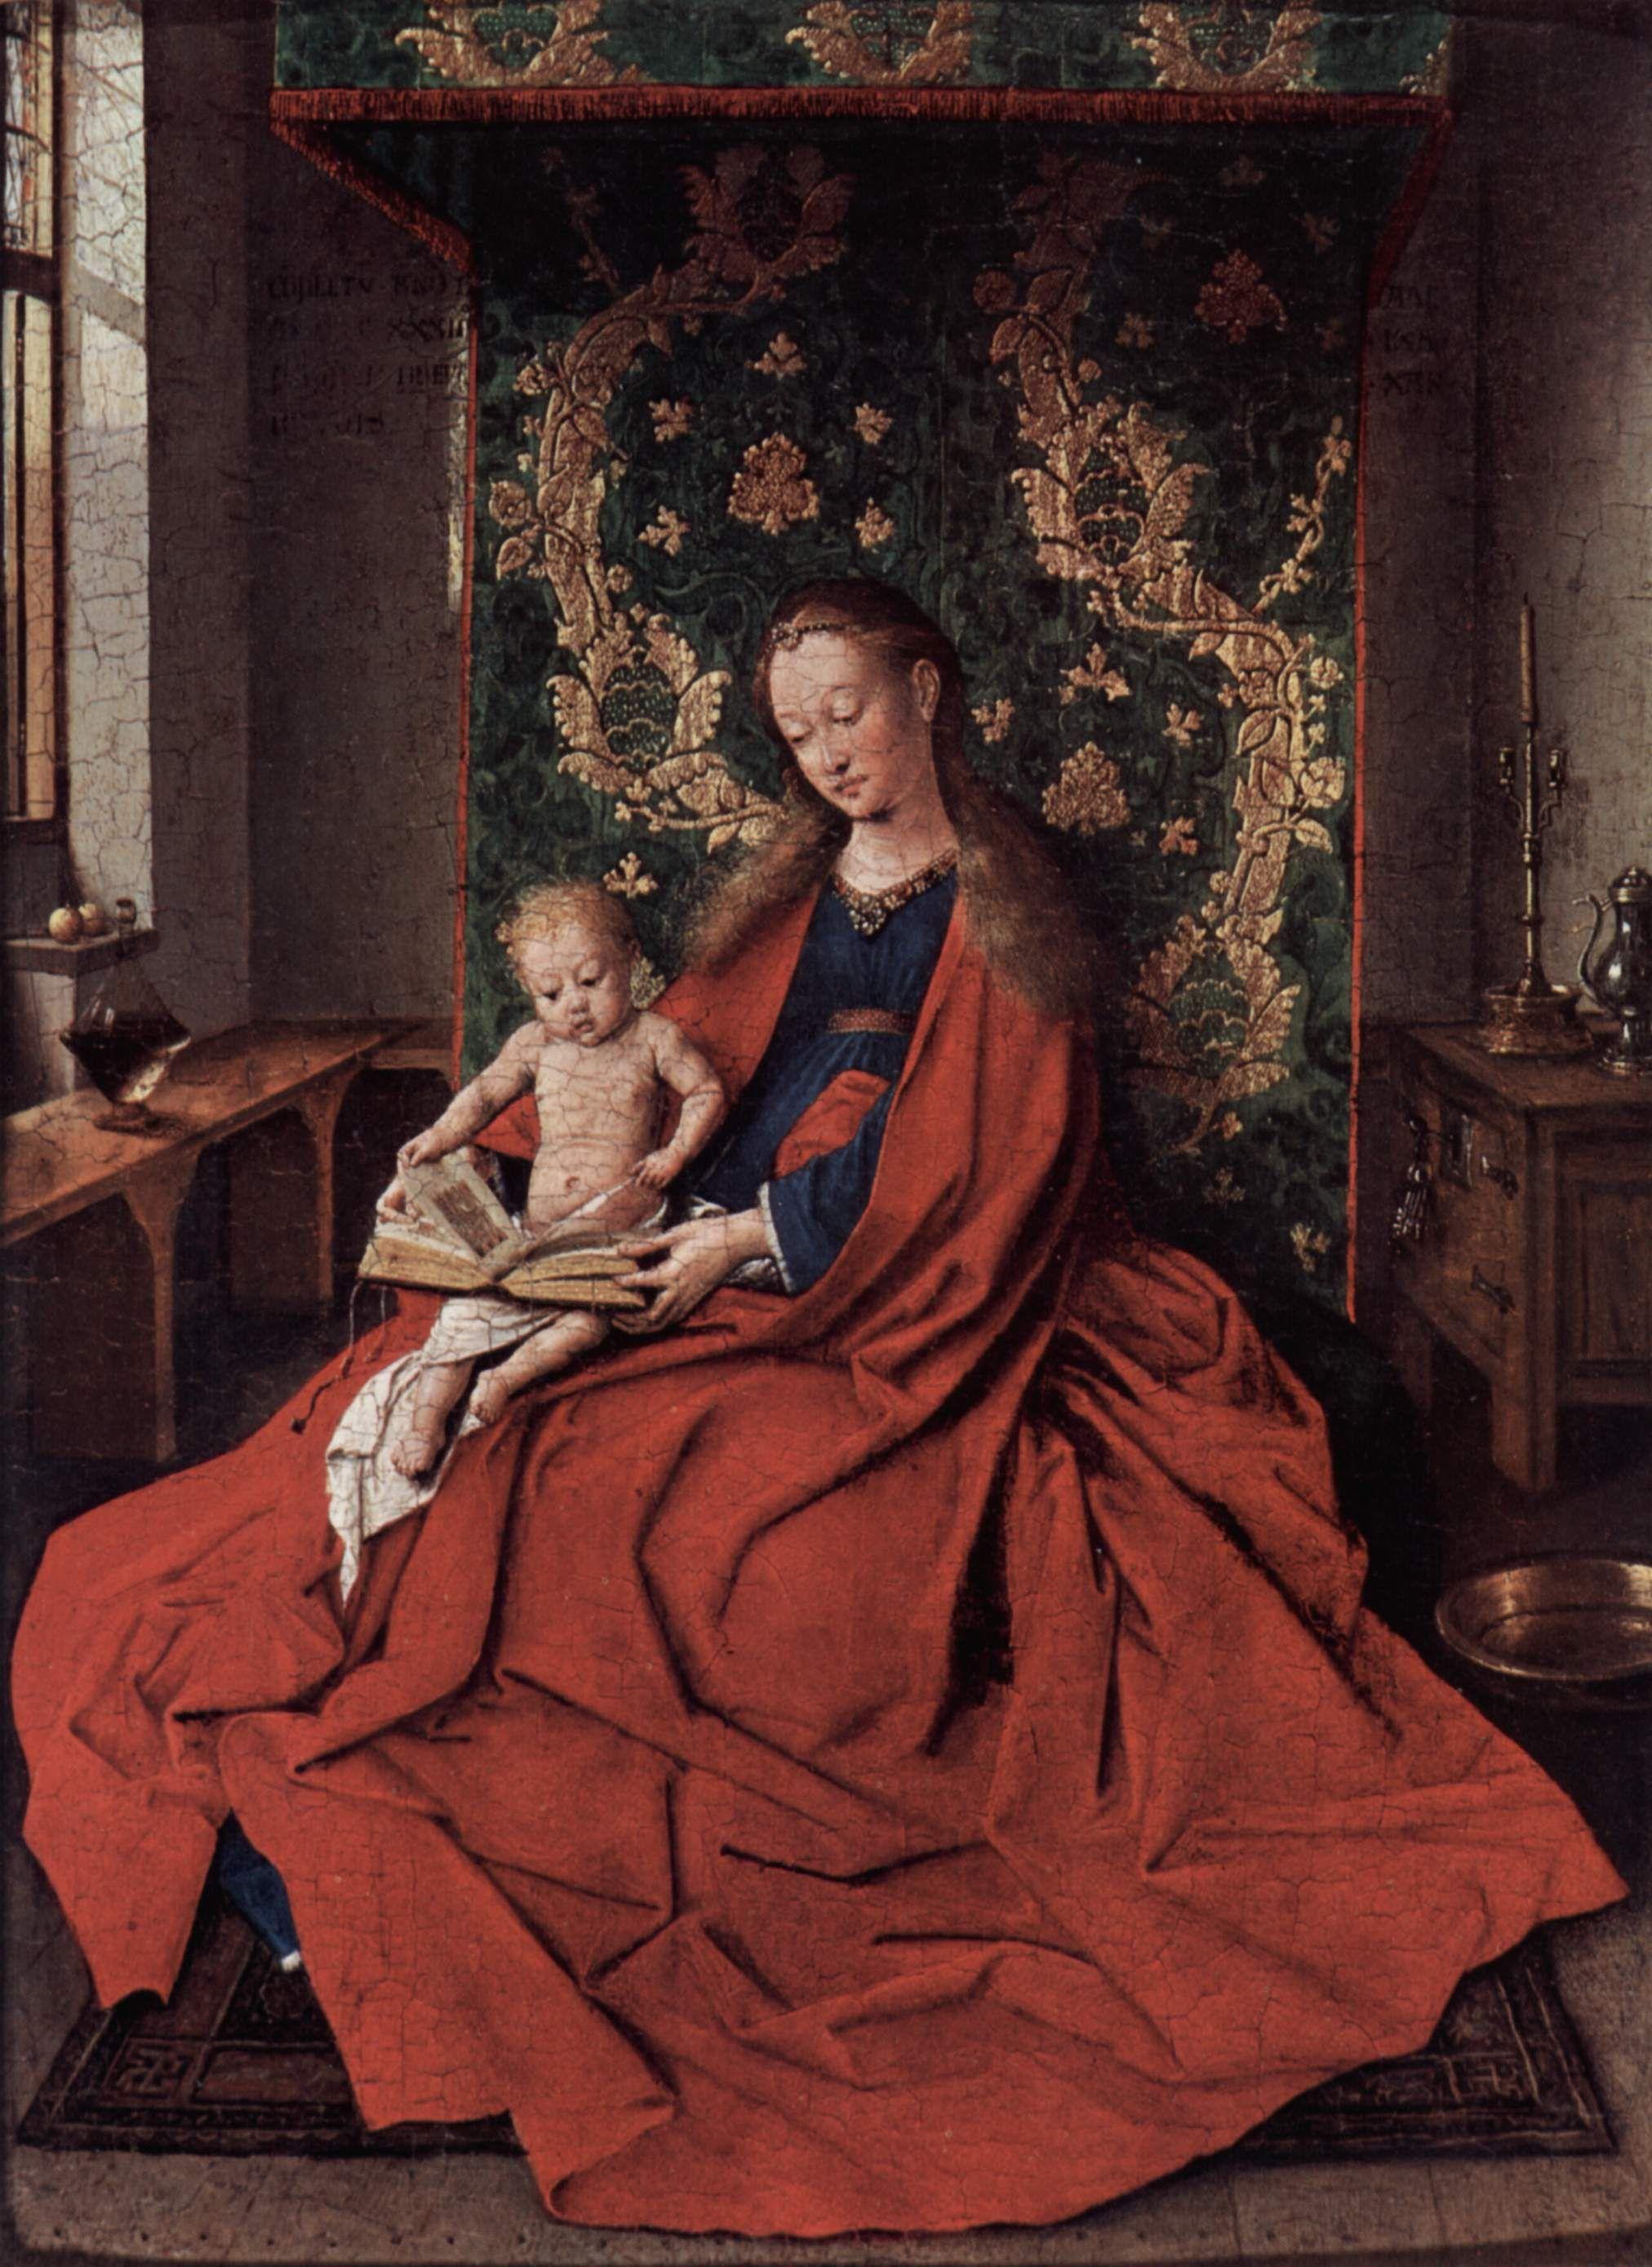 12 best images about Jan van Eyck on Pinterest | Jan van Eyck ...